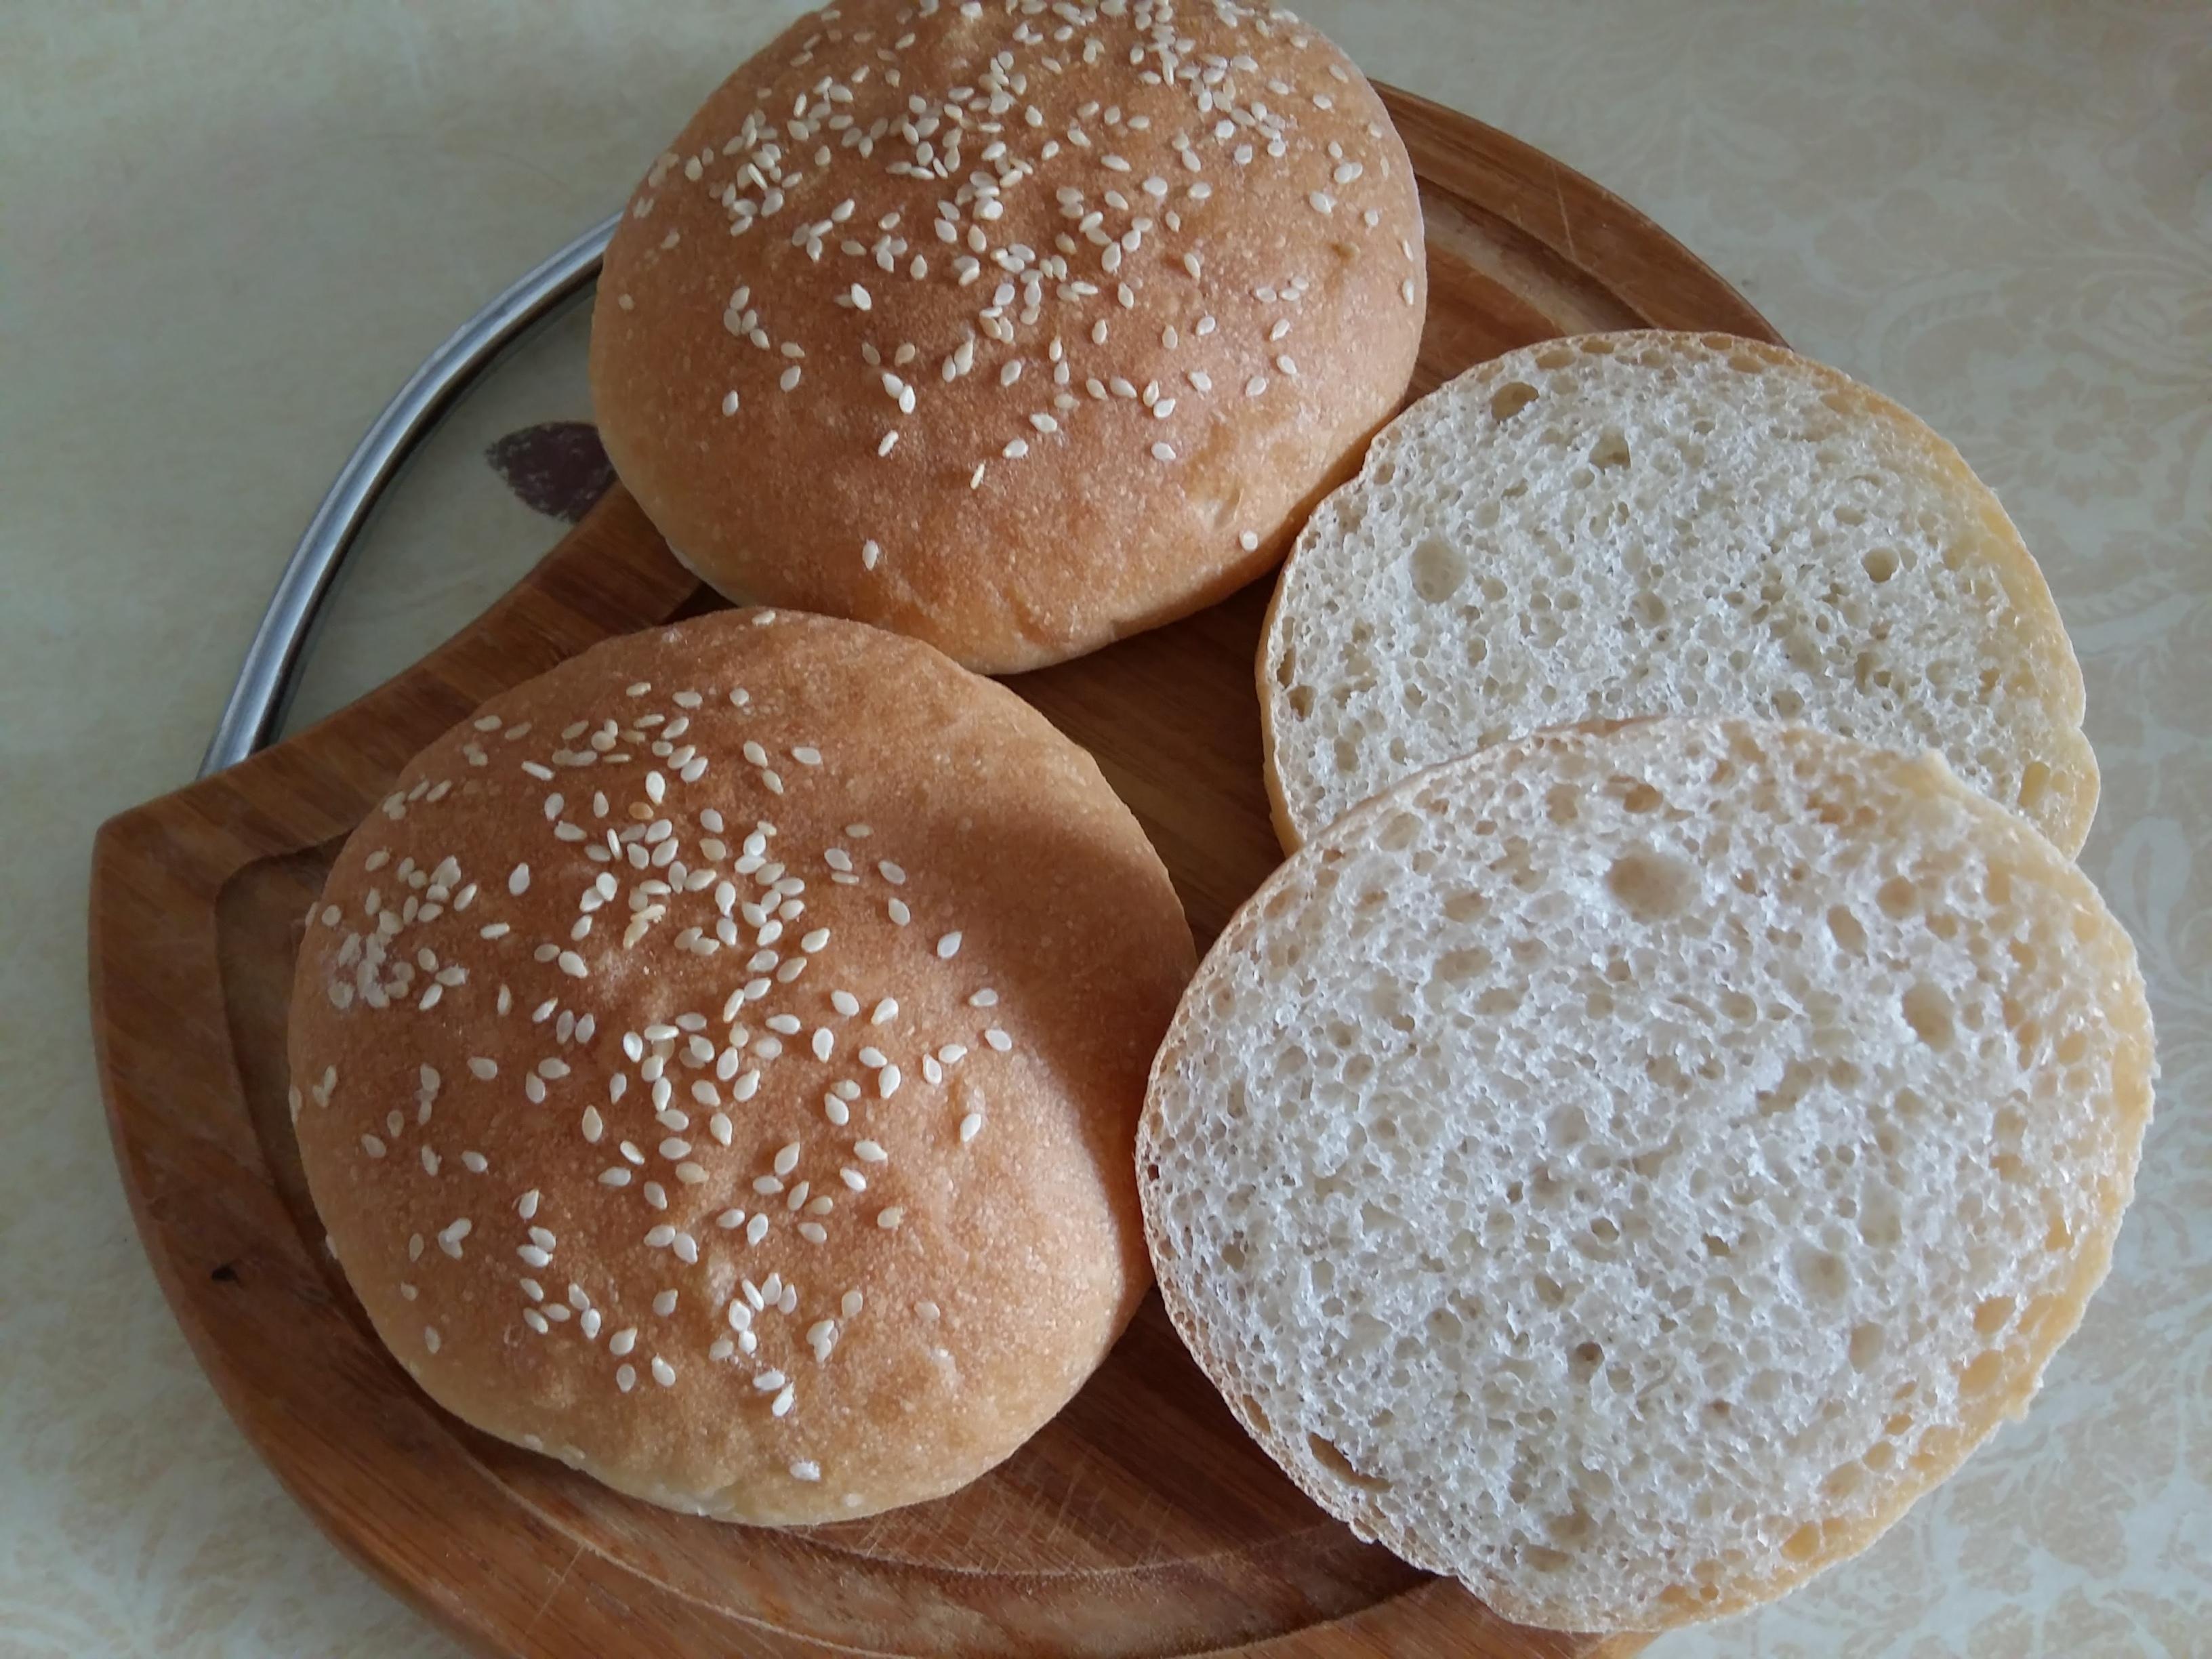 булочки для гамбургеров рецепт с фото пошагово всем